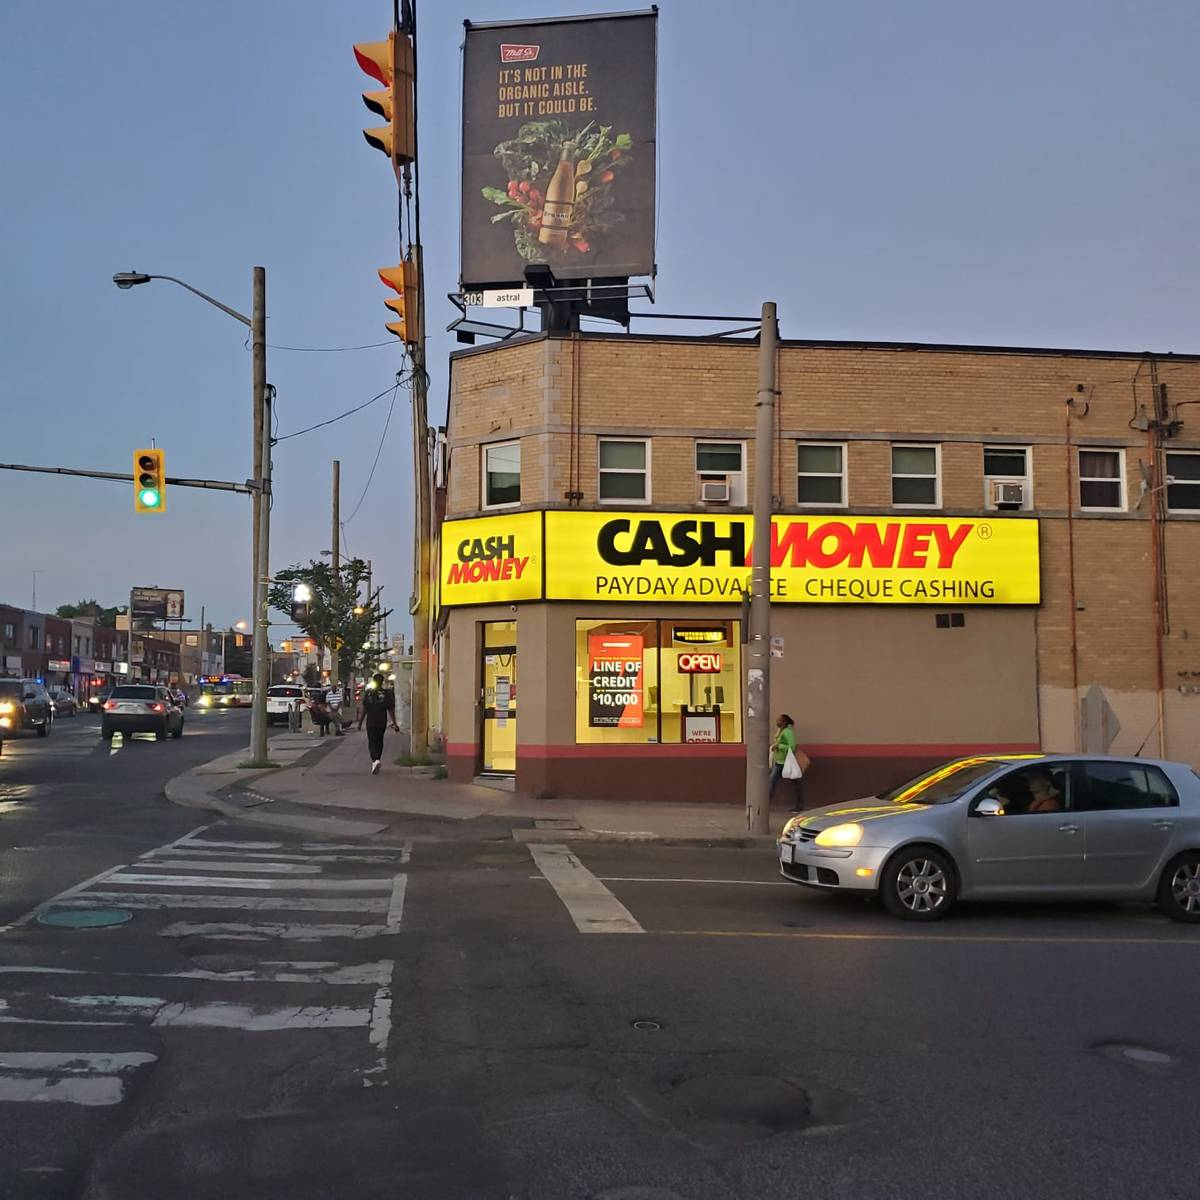 Cash Money store at 1575 Eglinton Ave West Toronto, ON M6E 2G9